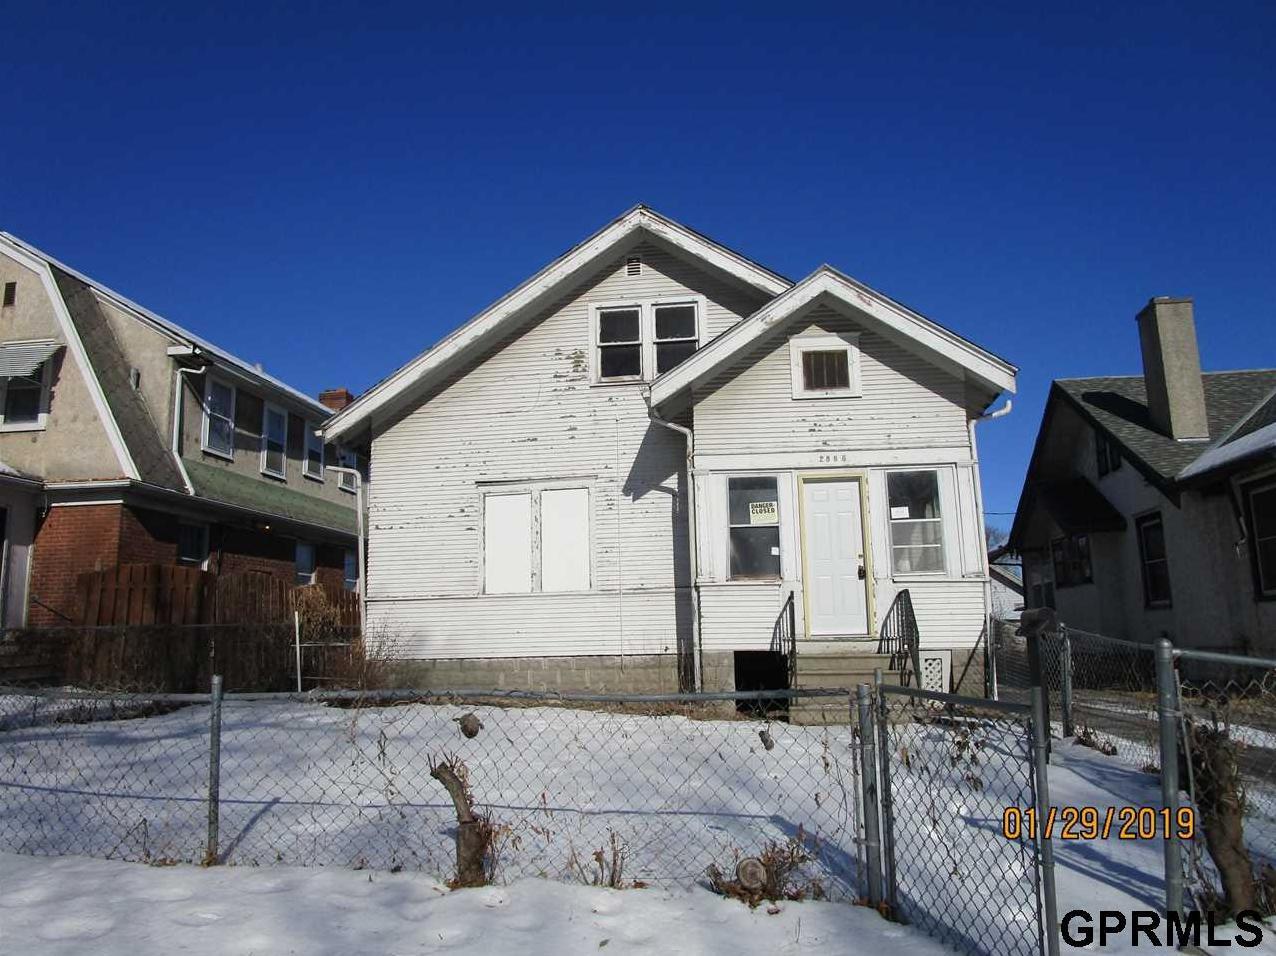 Photo of 2886 Bauman Avenue Omaha NE 68112